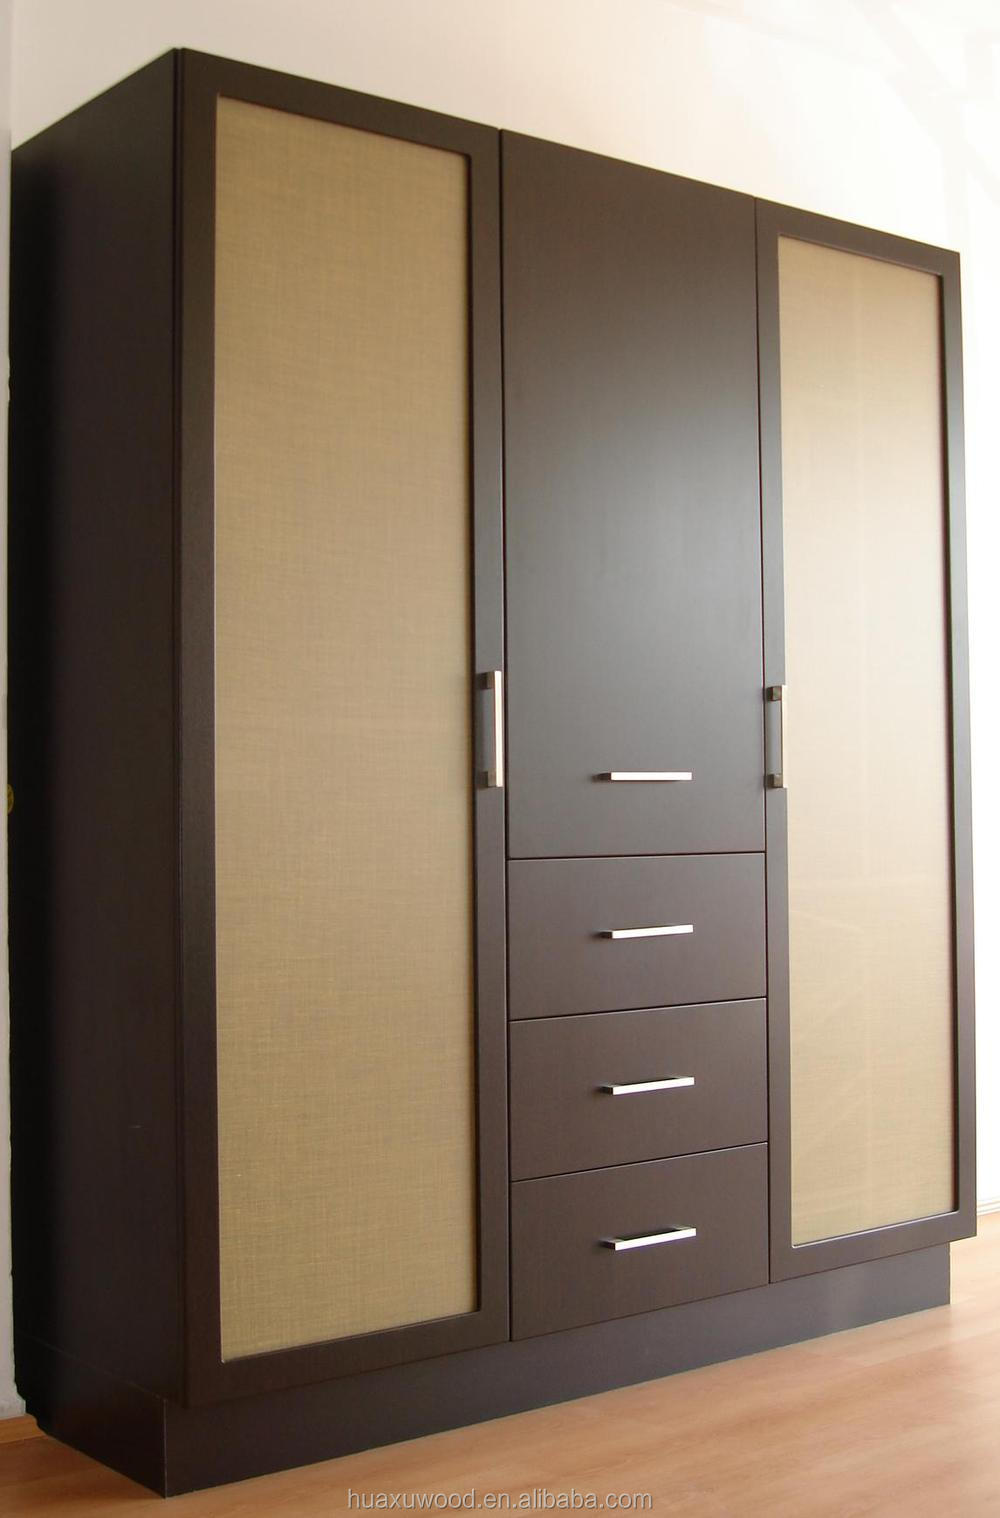 Hxsl Wood Closet Organizers Design In Bedroom Furniture Buy Modern Wood Closet Organizer Design Bedroom Wood Furniture Home Furniture Closet